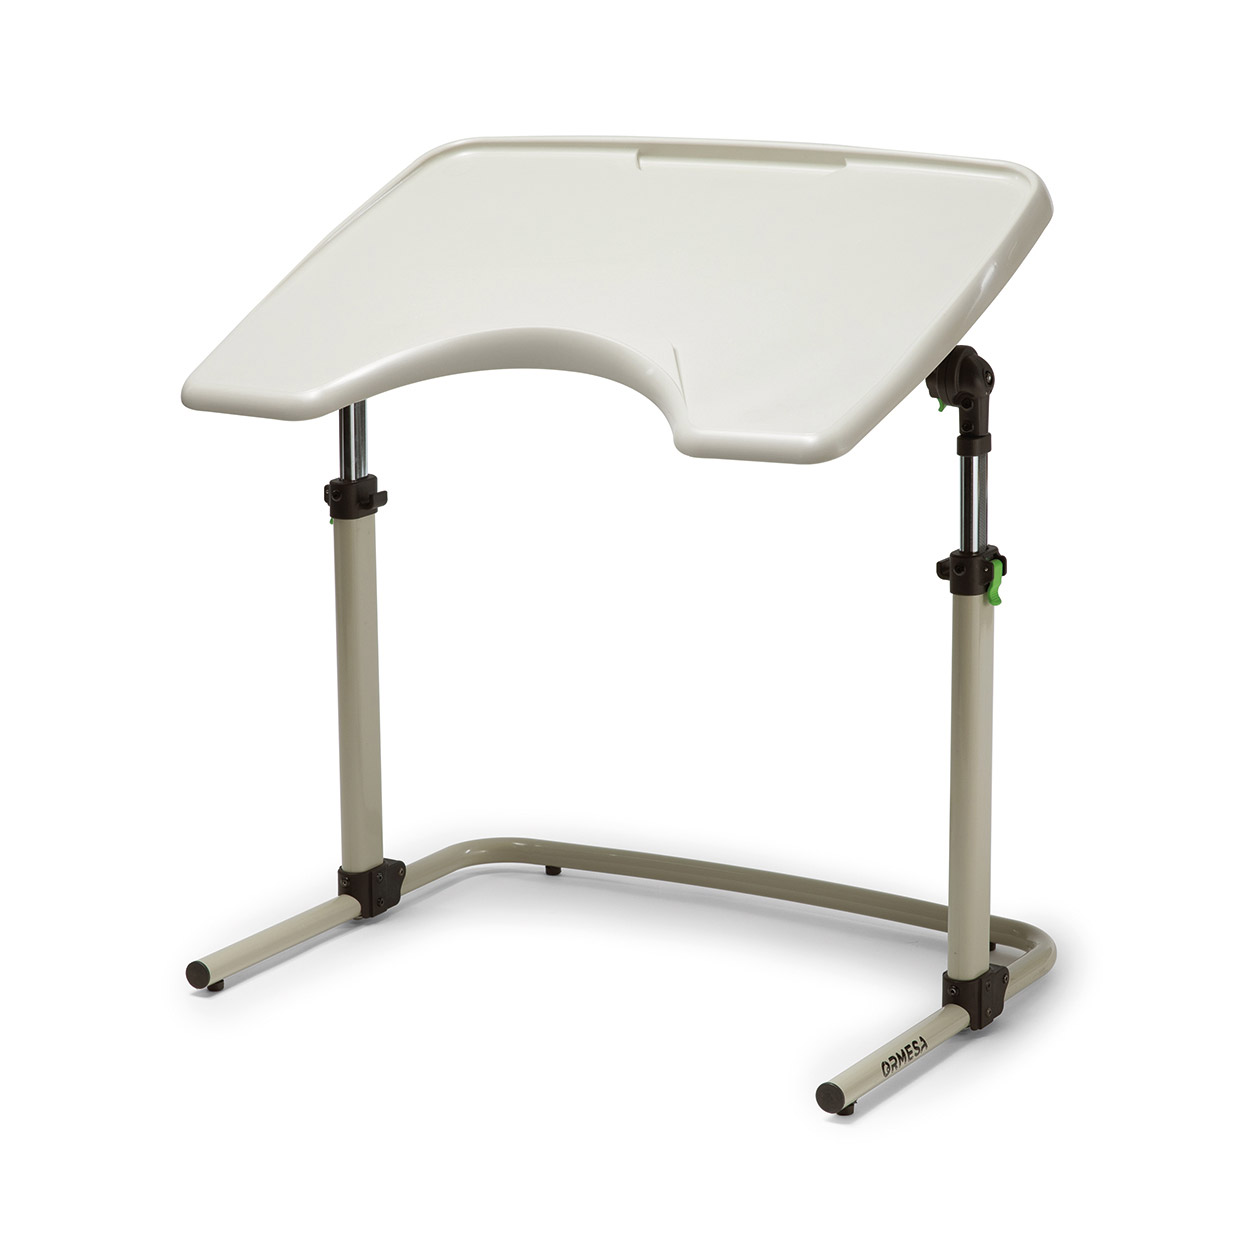 Ormesa School Table | Medicaleshop